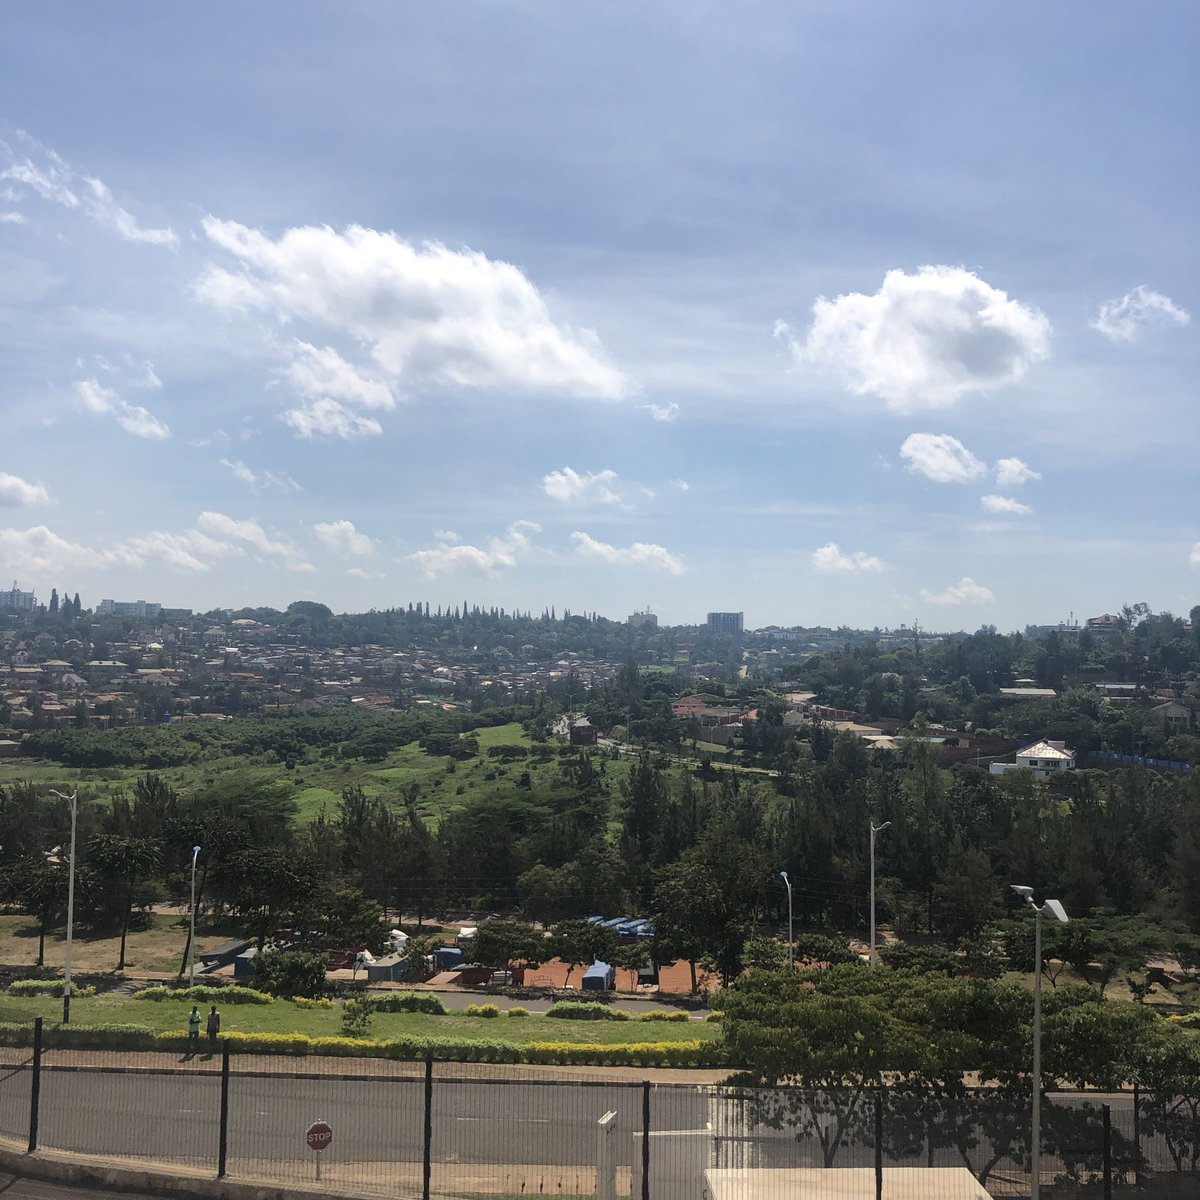 test Twitter Media - I Rwanda. Klar til første dag med optagelser til nyt undervisningsmateriale #ungeforandrerverden for #unicefdk  Besøg på #FabLab og #mygreenhome ##skolechat 👀 vi er klar til skolestart i august👊🏽 https://t.co/8BwHy1VMOk